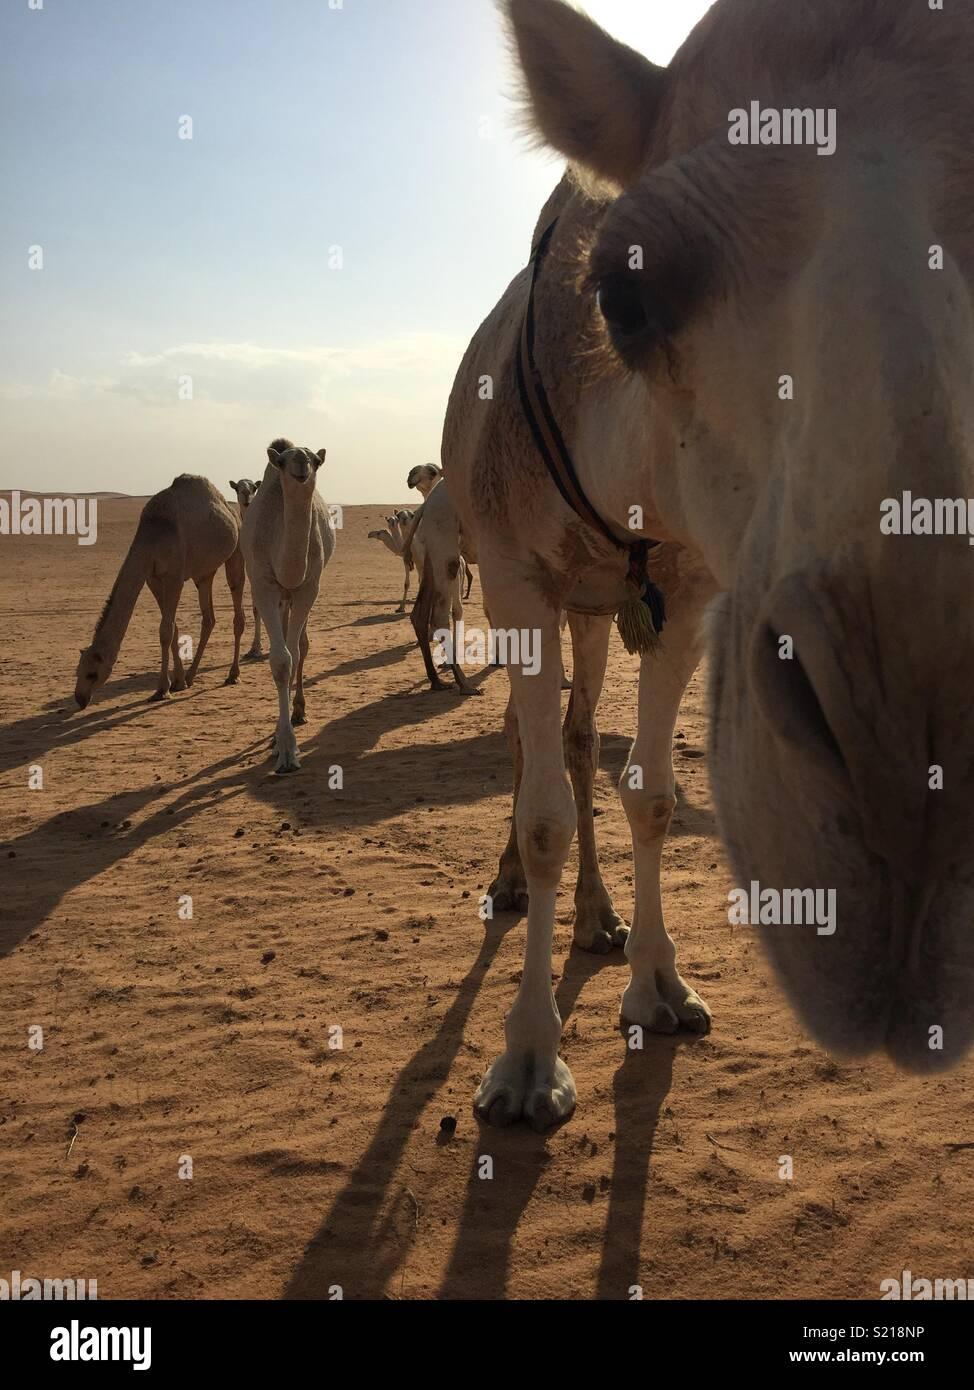 Inquisitive camel. - Stock Image